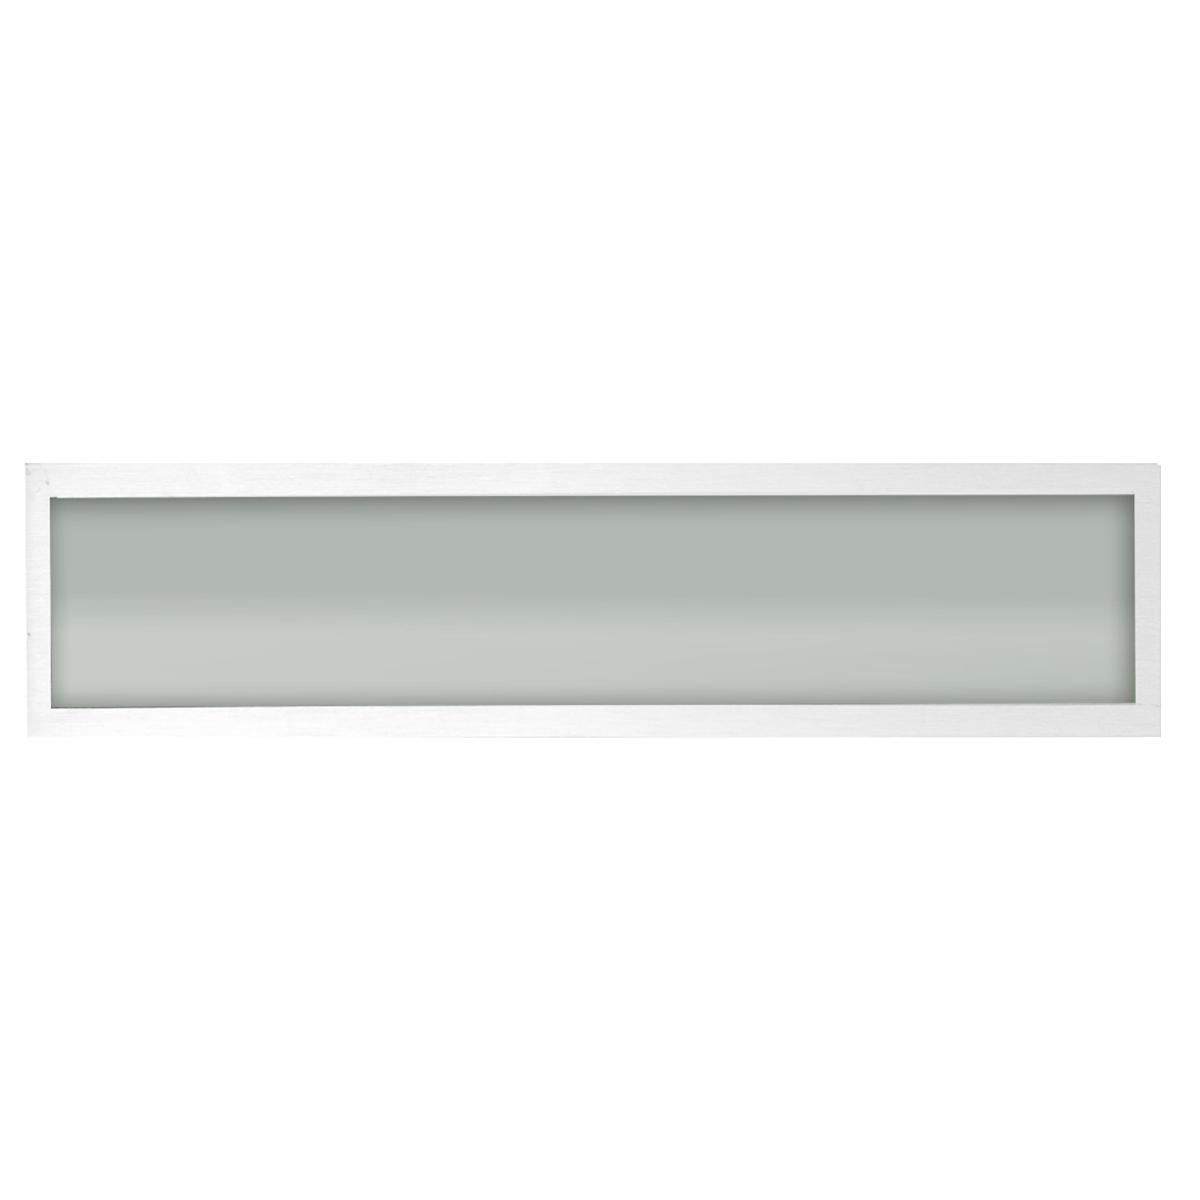 Plafon Space Sobr. Ret. 75cm Alum. Vidro Fosco 2x20w Fluor. Branco